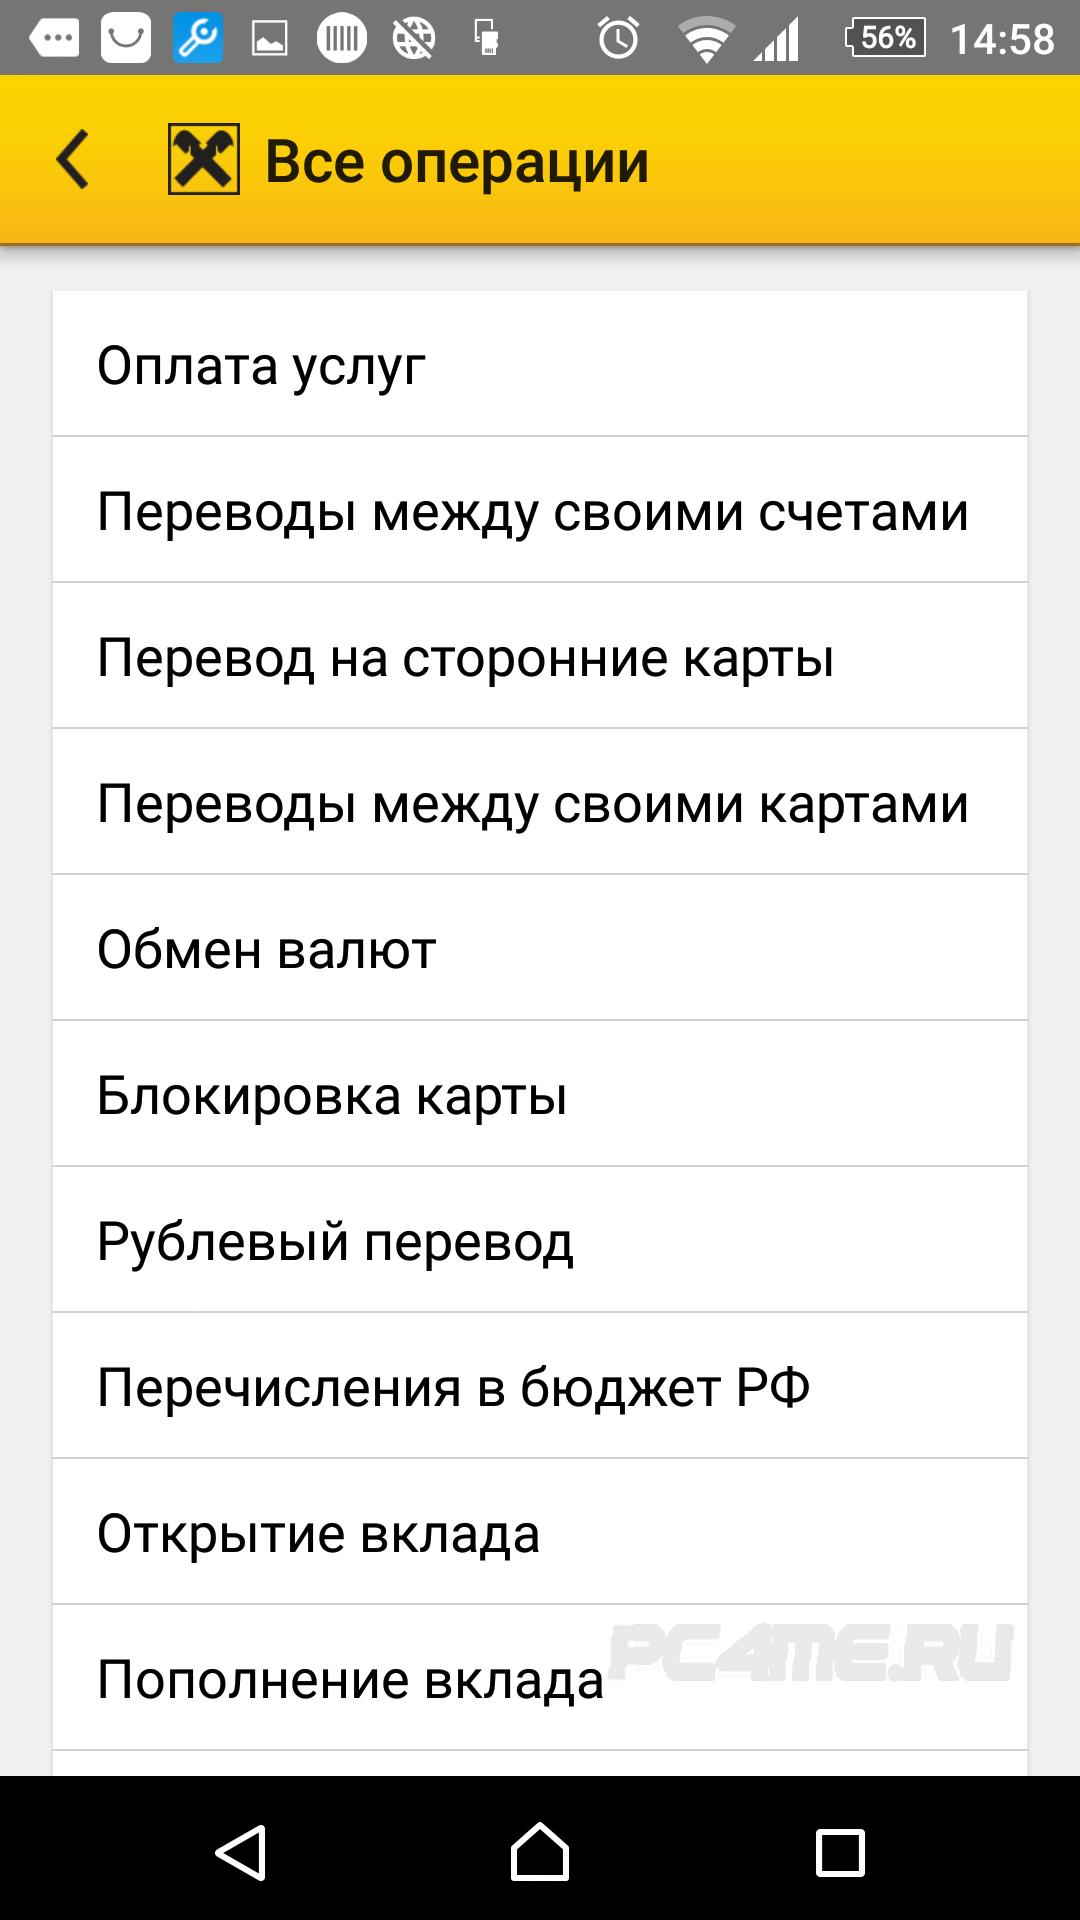 Screenshot_2016-09-08-14-58-16